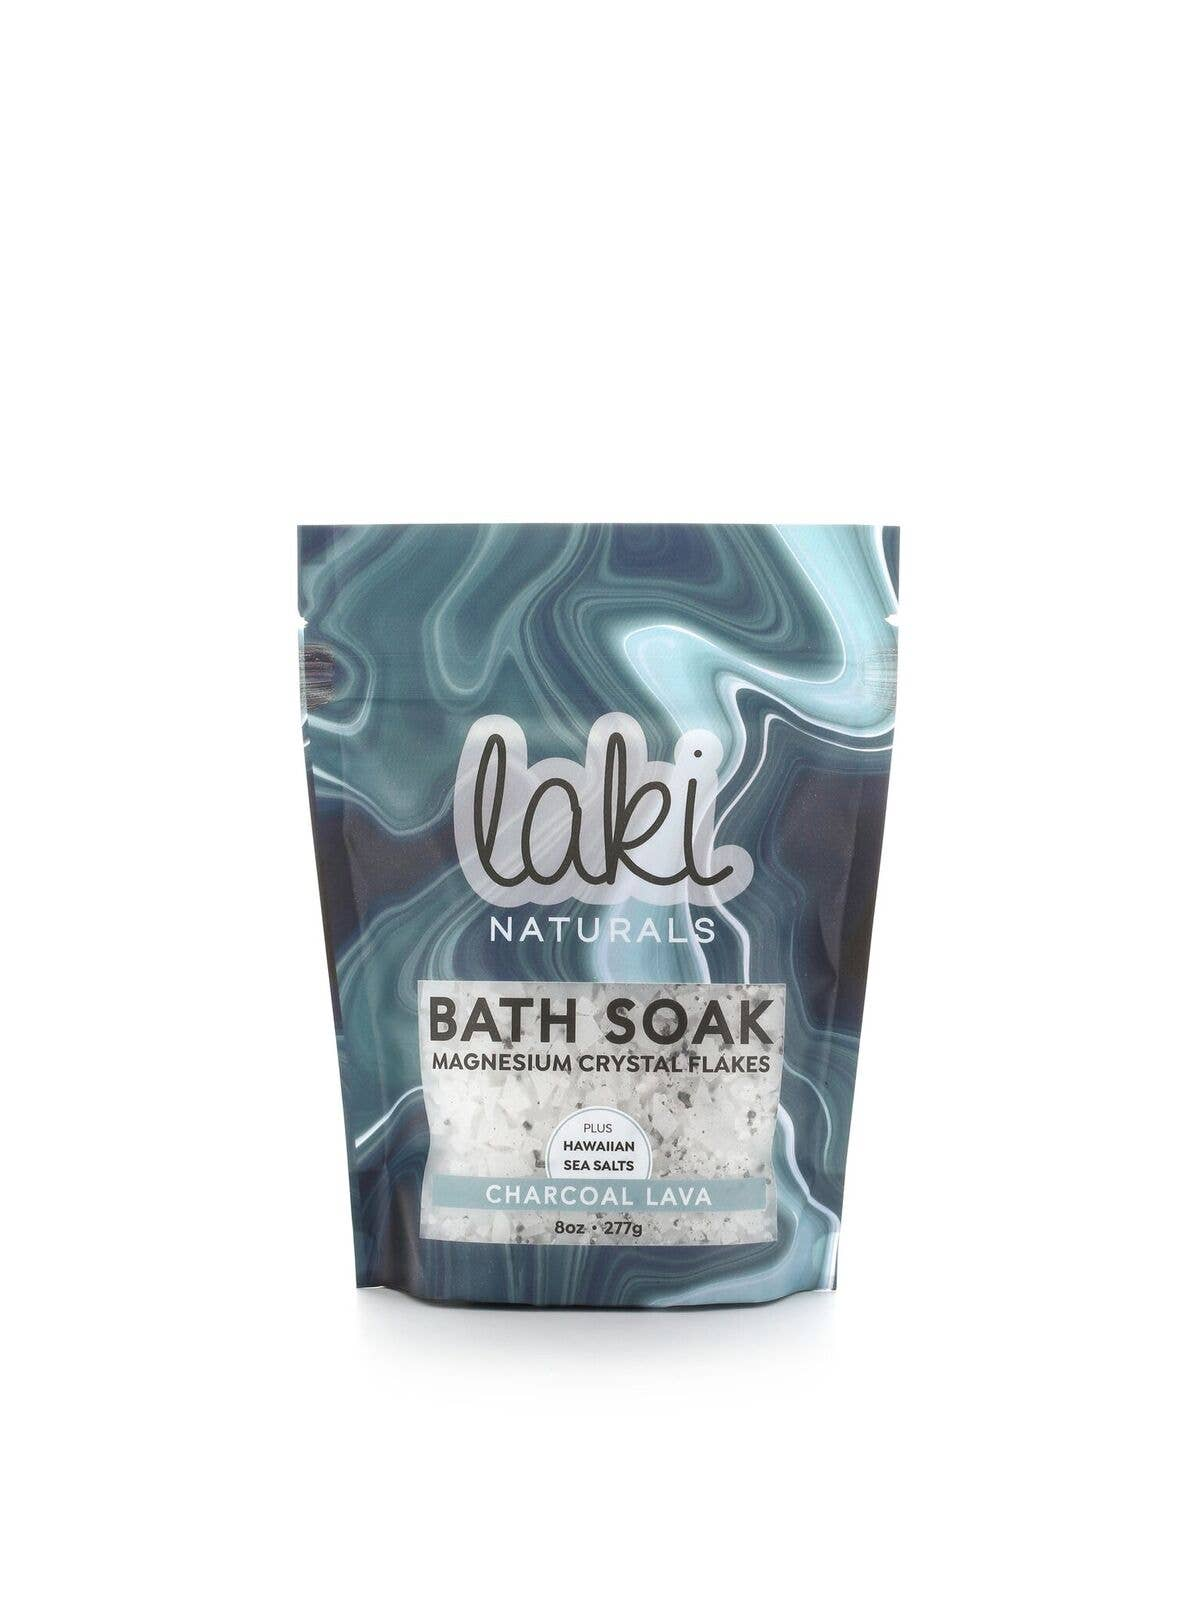 8 oz Charcoal Lava Magnesium Flake Soak | Trada Marketplace